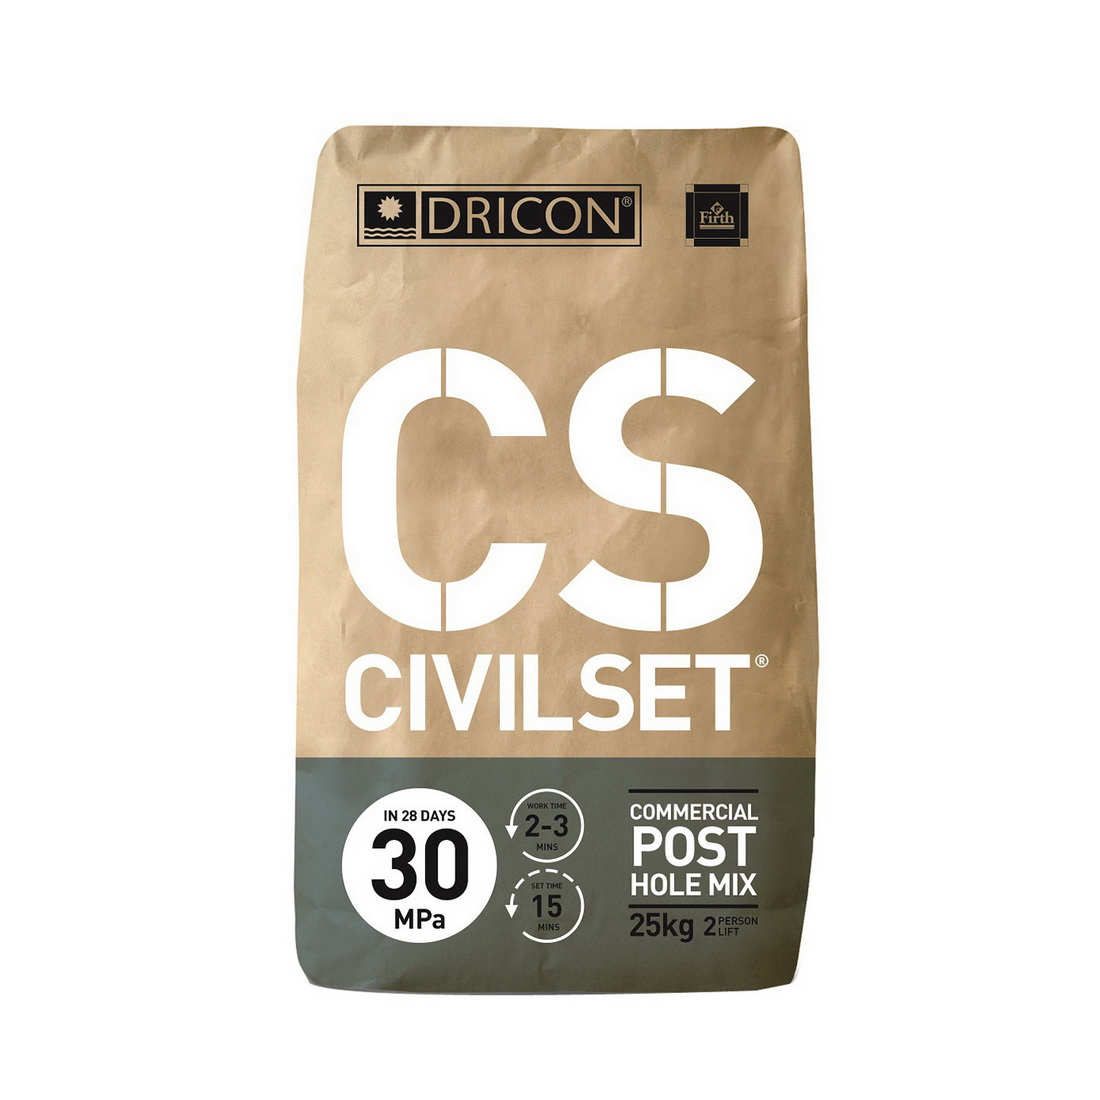 CivilSet 25kg